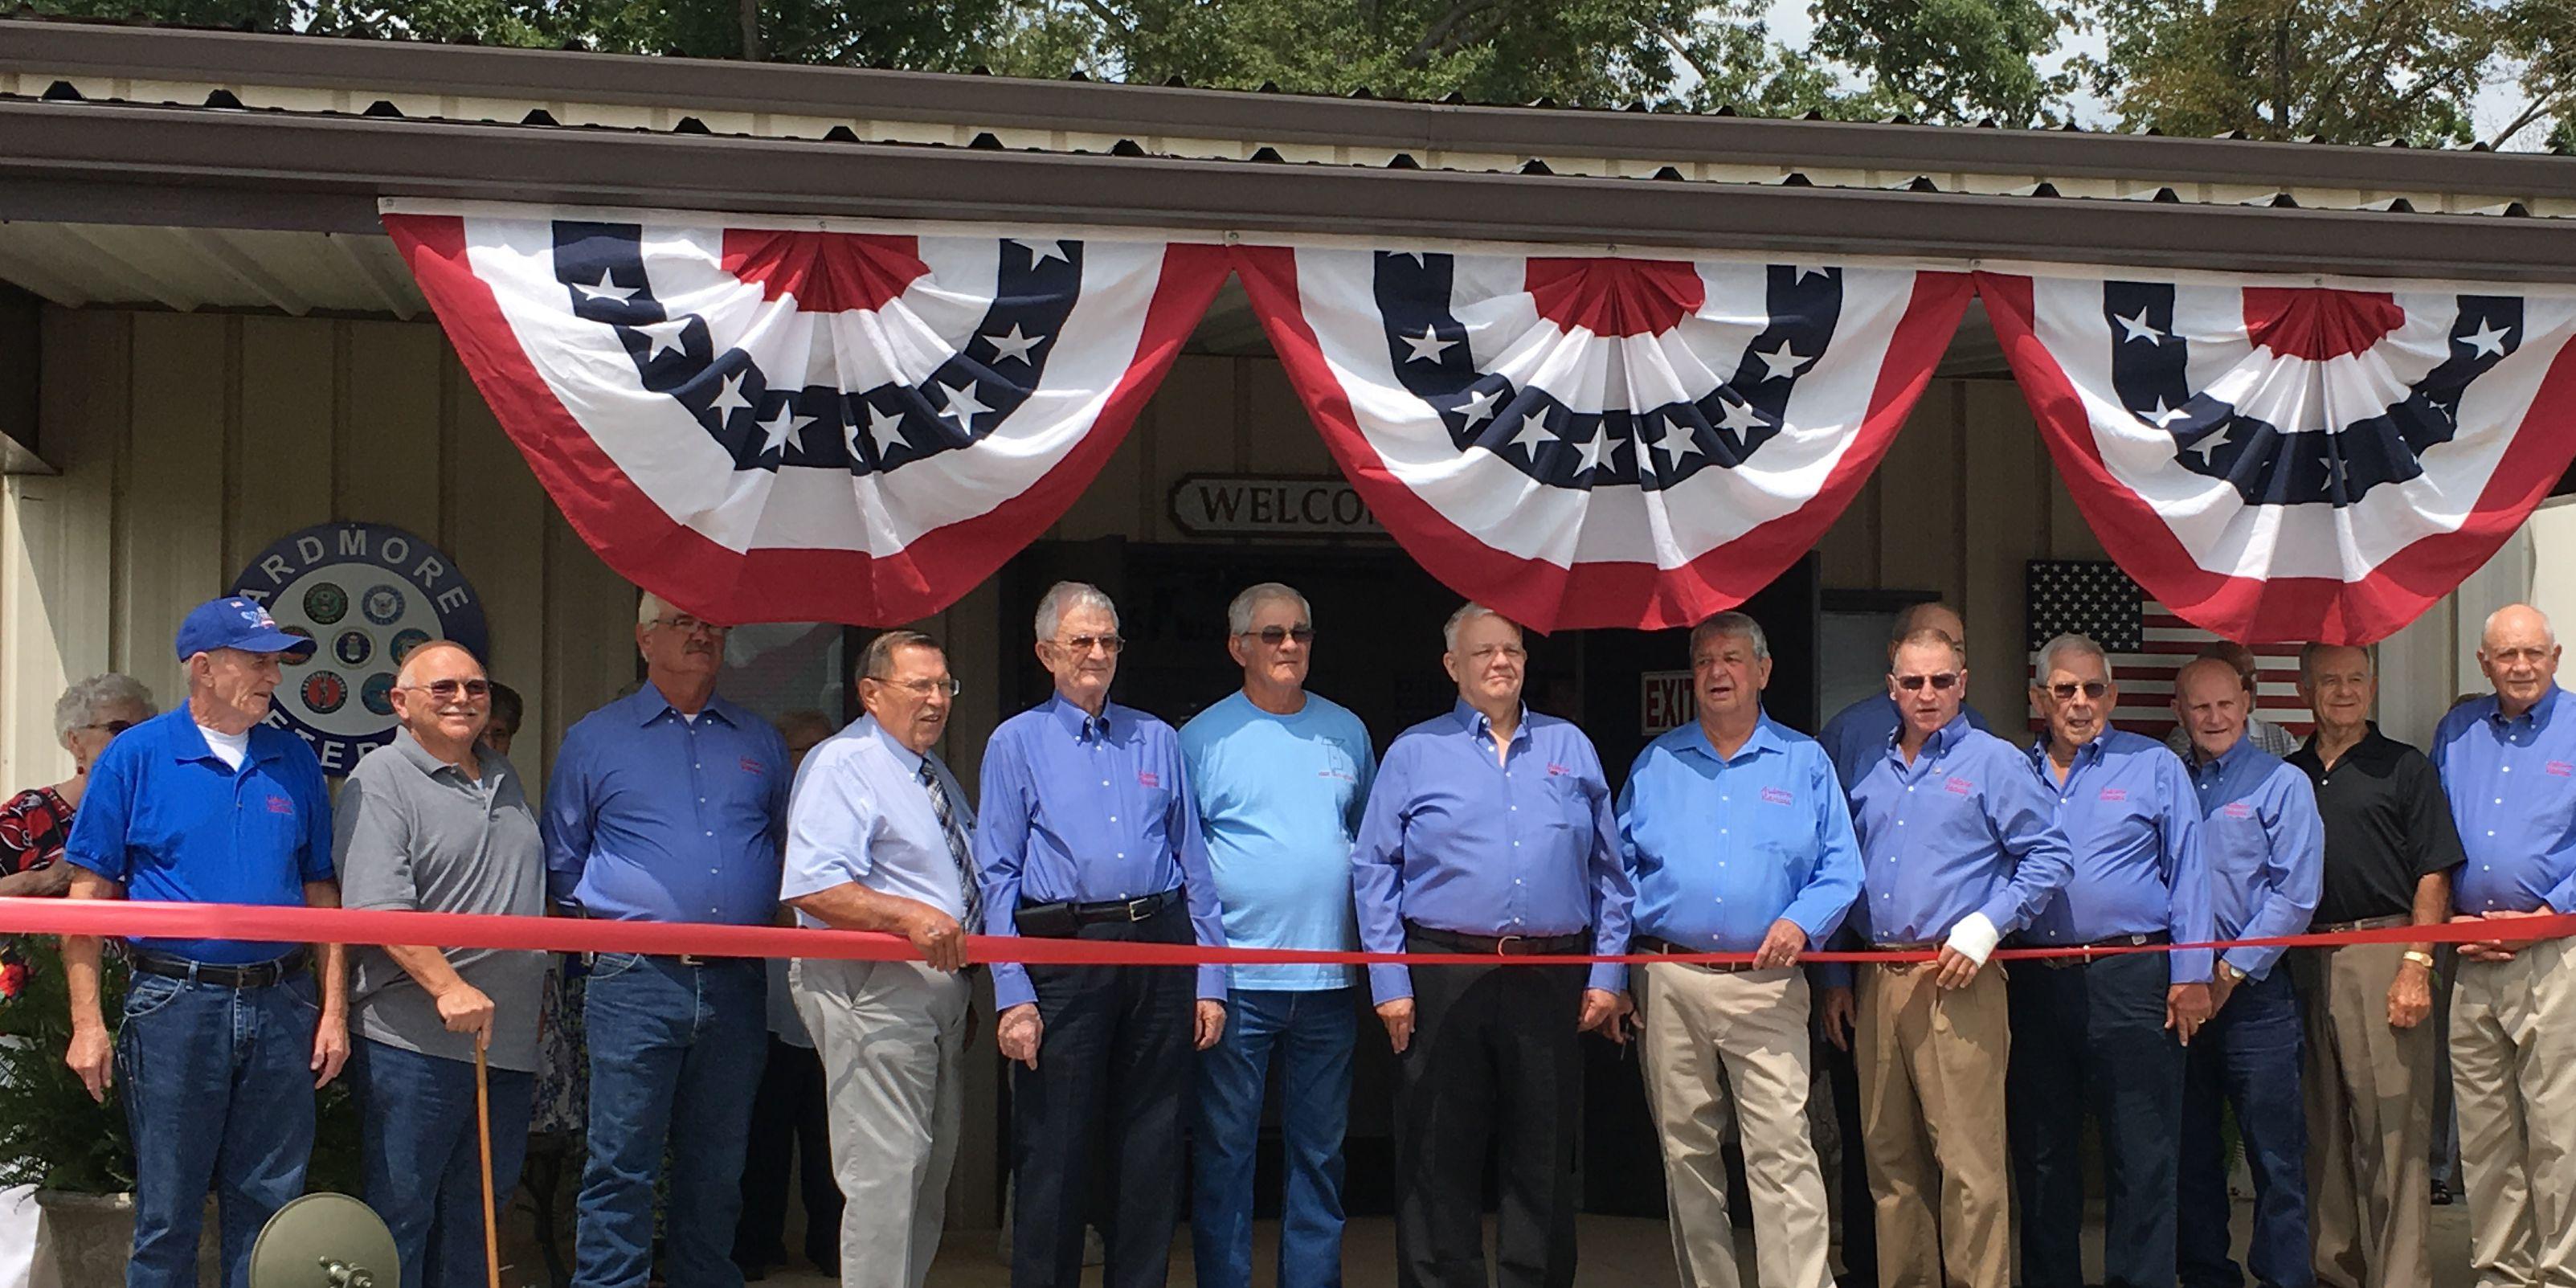 Veterans welcome new museum in Ardmore, TN